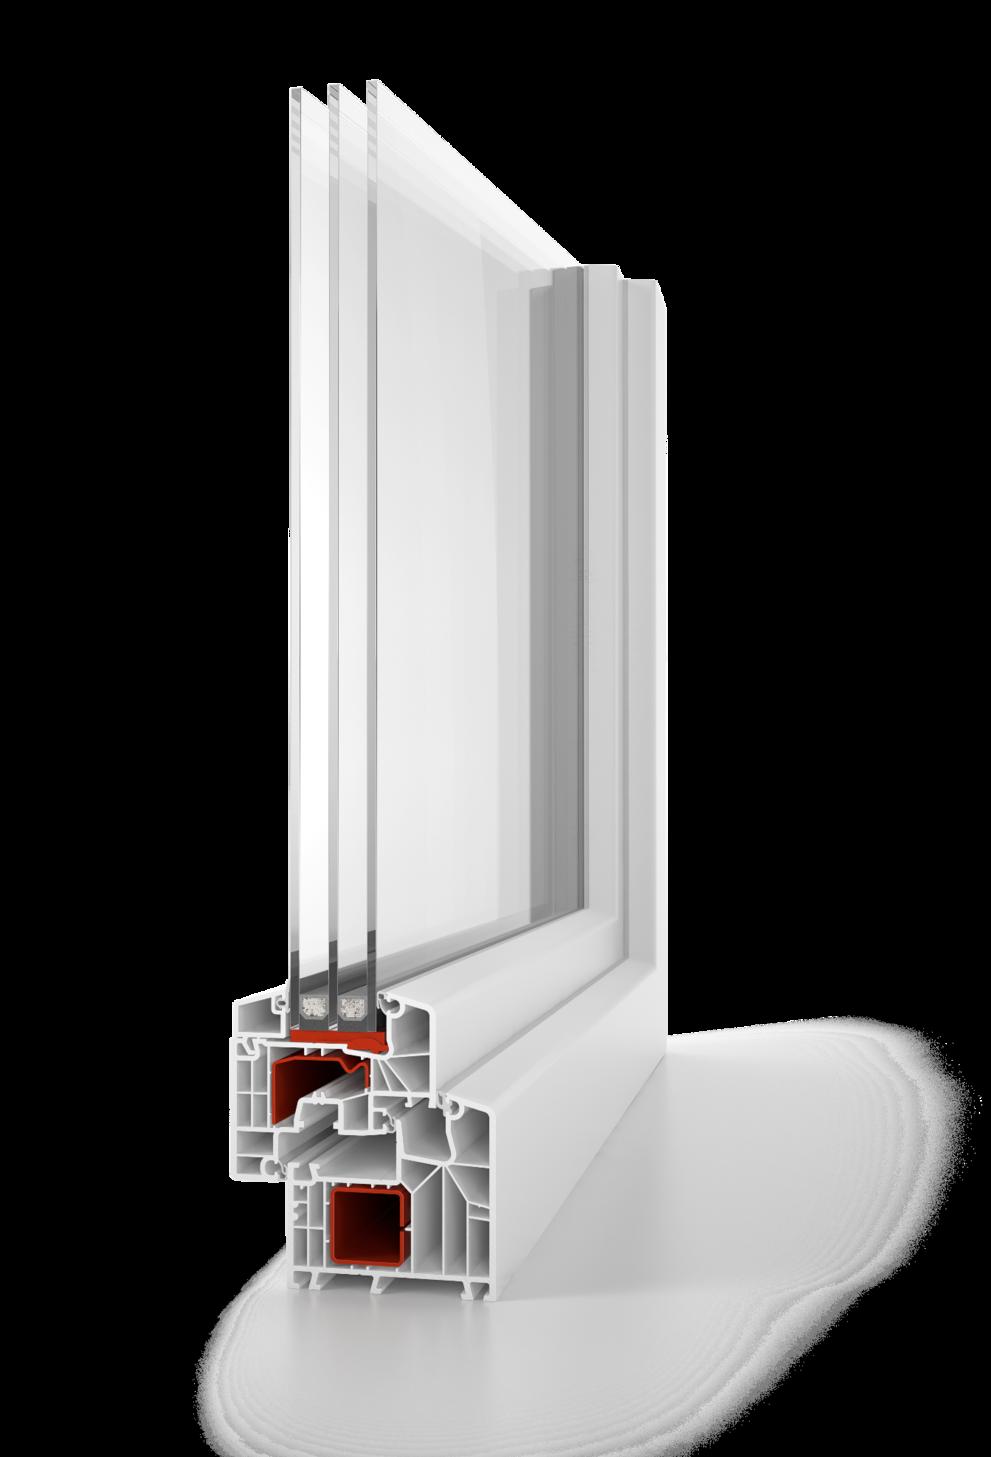 Full Size of Aluplast Erfahrung Ideal 8000 85mm Bautiefe Fr Das Plus An Sicherheit Fenster Wohnzimmer Aluplast Erfahrung